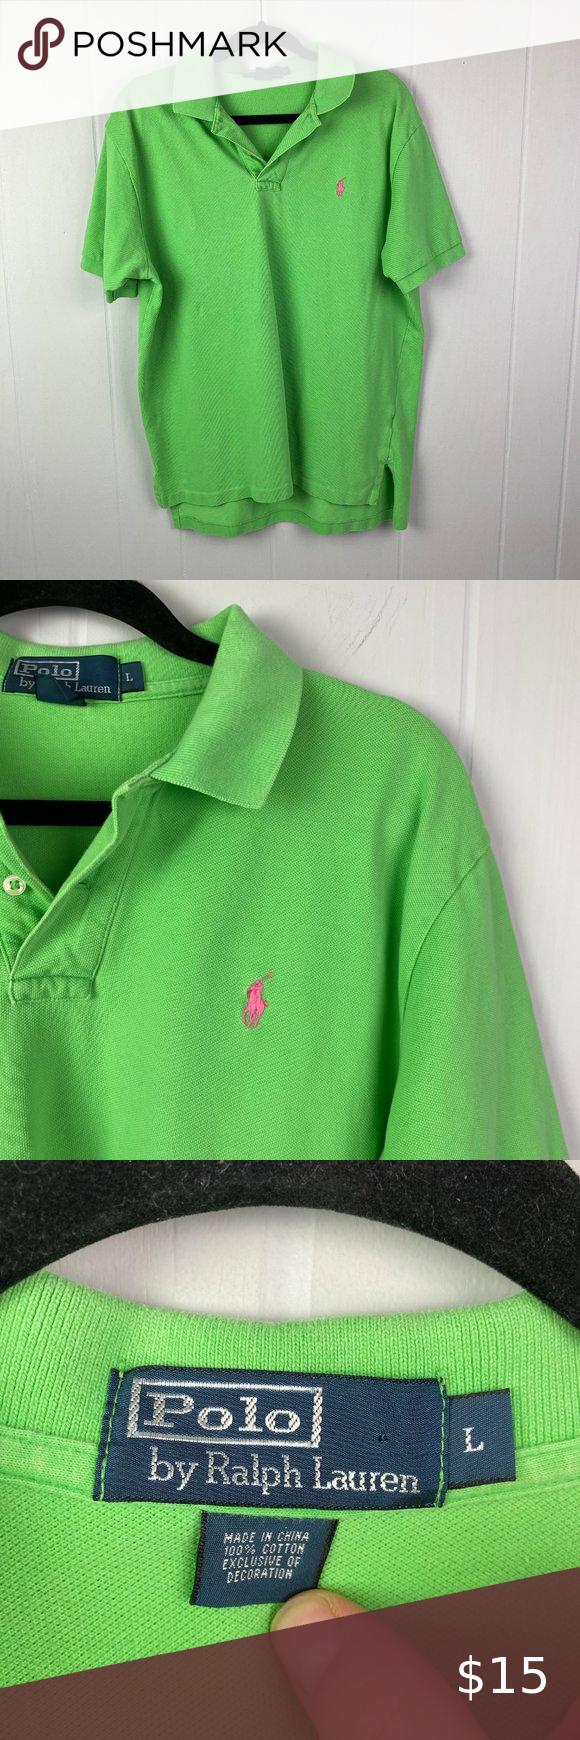 Polo Size L Bright Green Polo Shirt Green Polo Shirts Polo Shirt Shirts